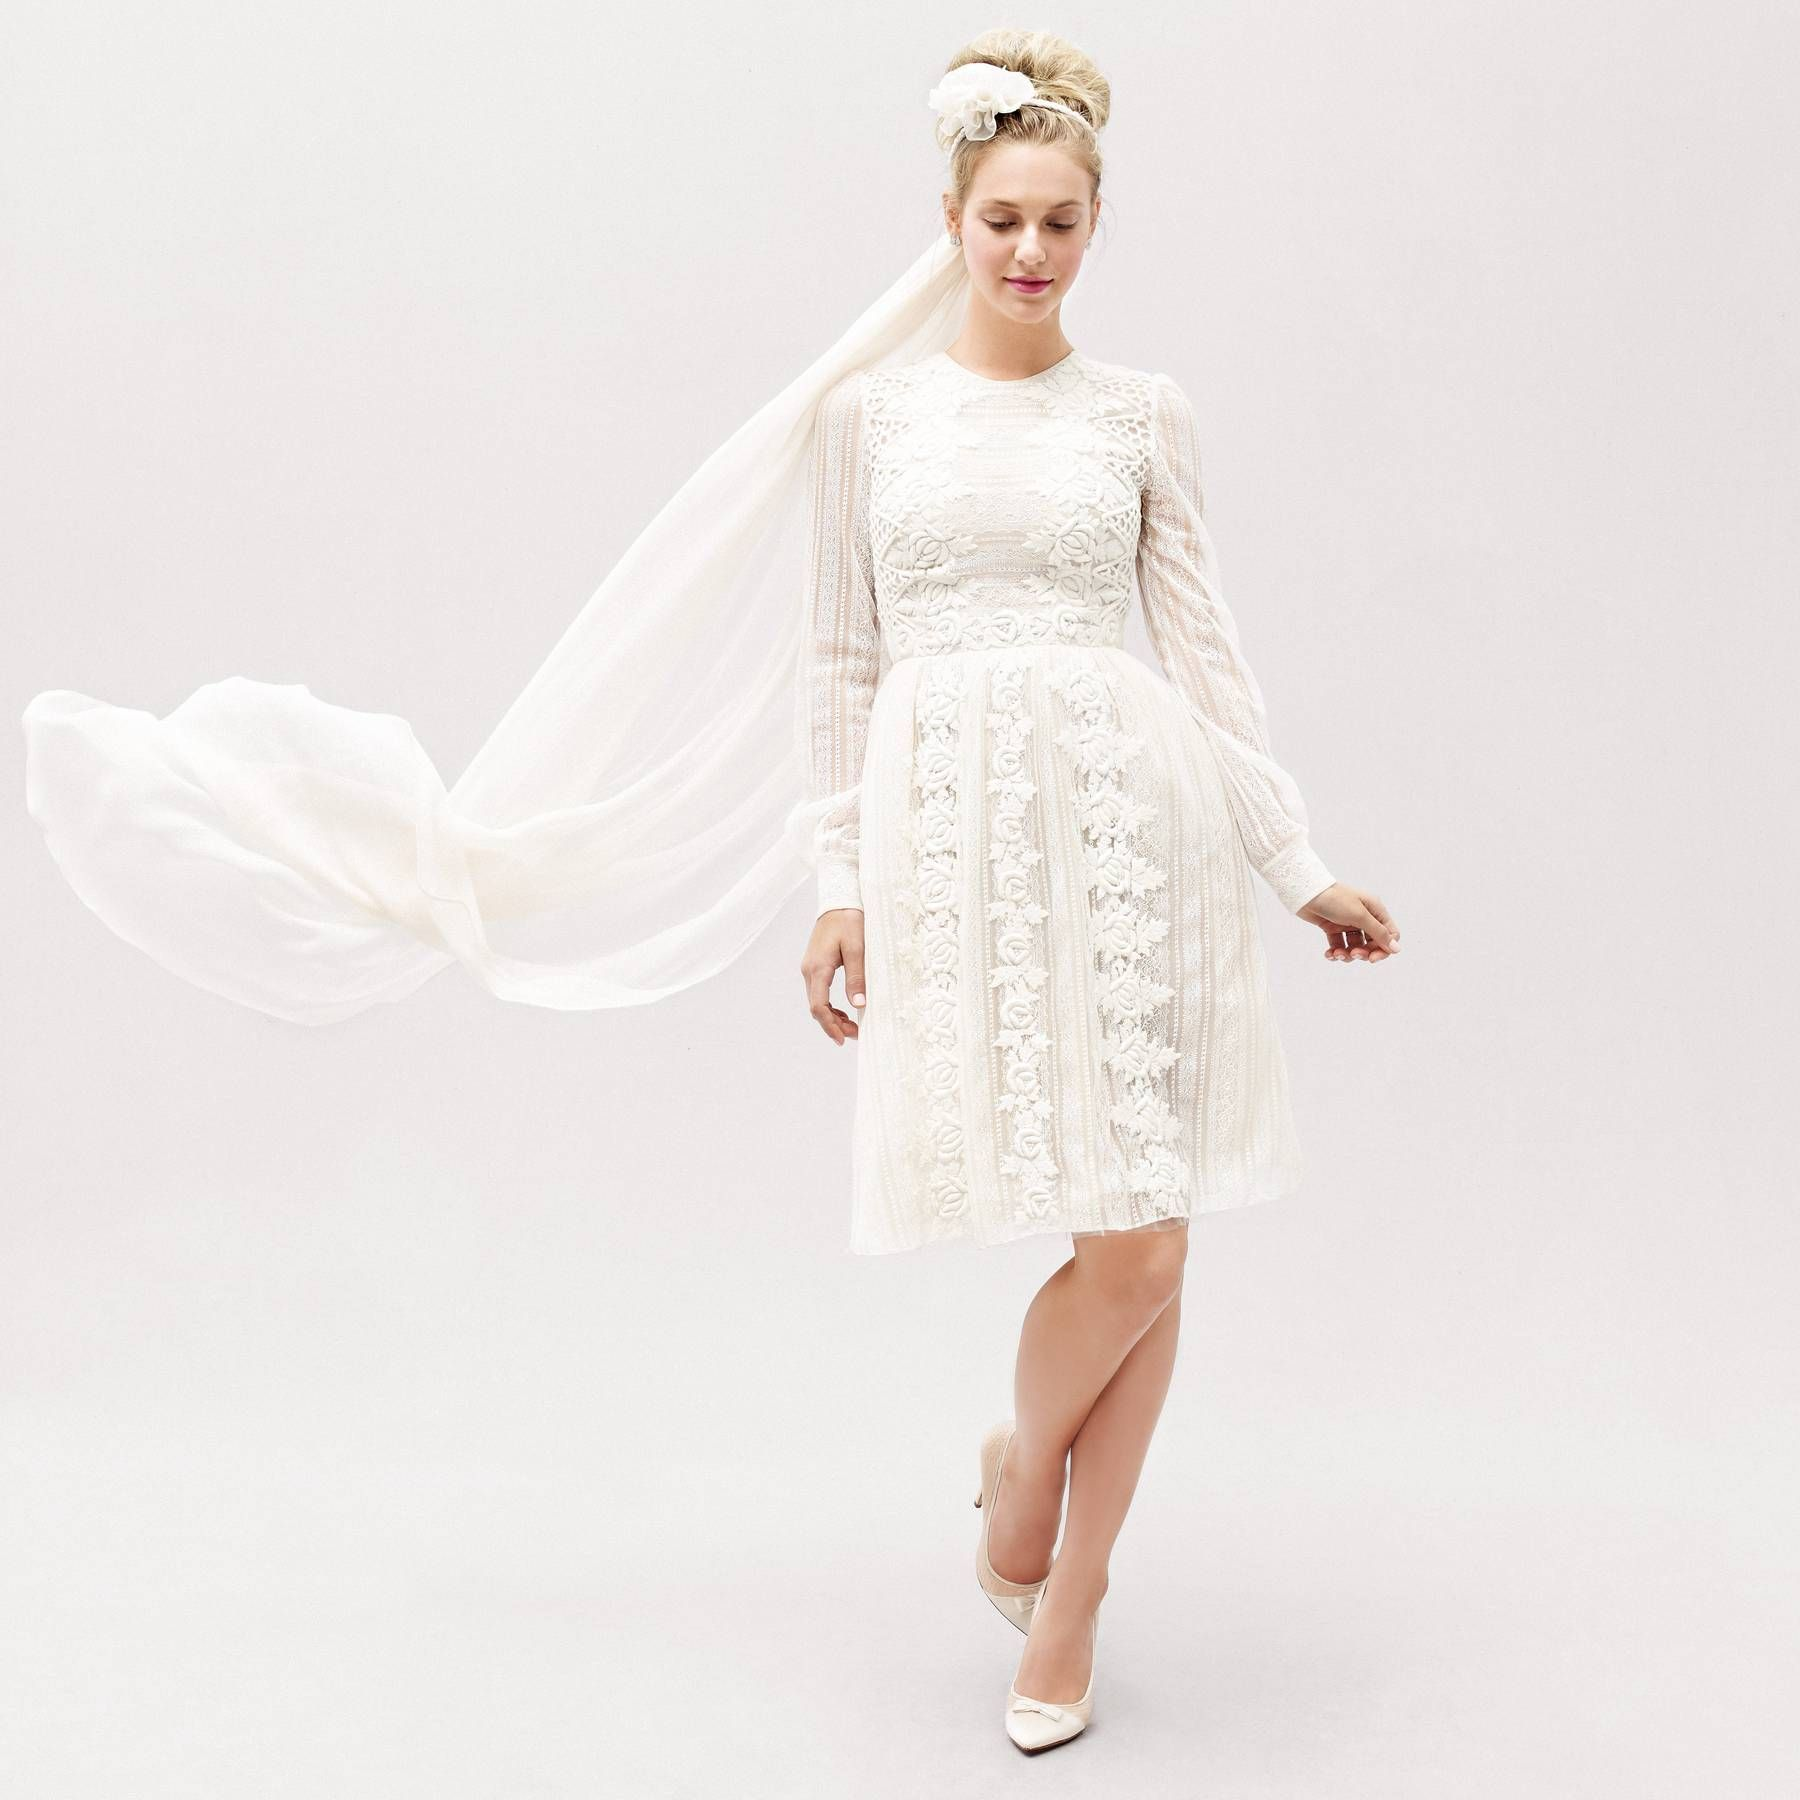 Eight Outrageously Unique Wedding Dresses